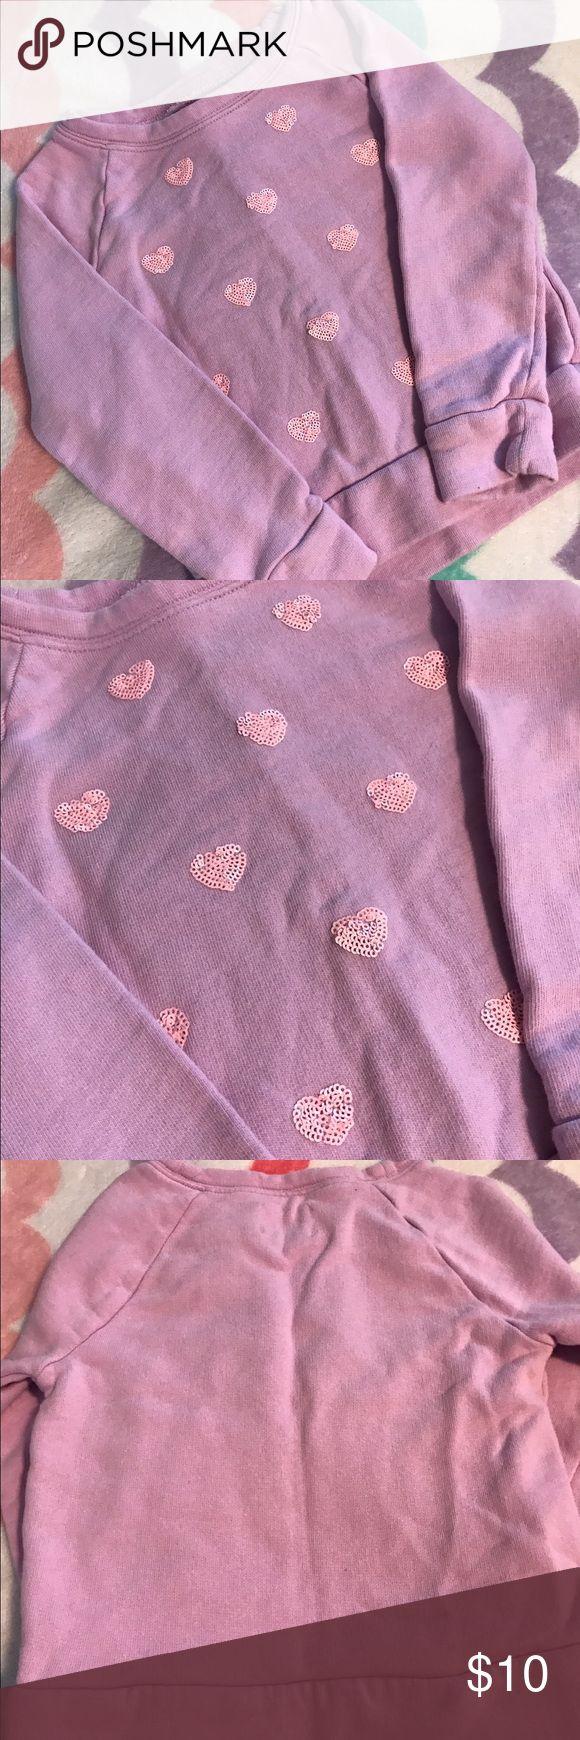 Crew Cuts Sweatshirt 4t Pink sweatshirt with sequins hearts. Excellent used condition. J. Crew Shirts & Tops Sweatshirts & Hoodies